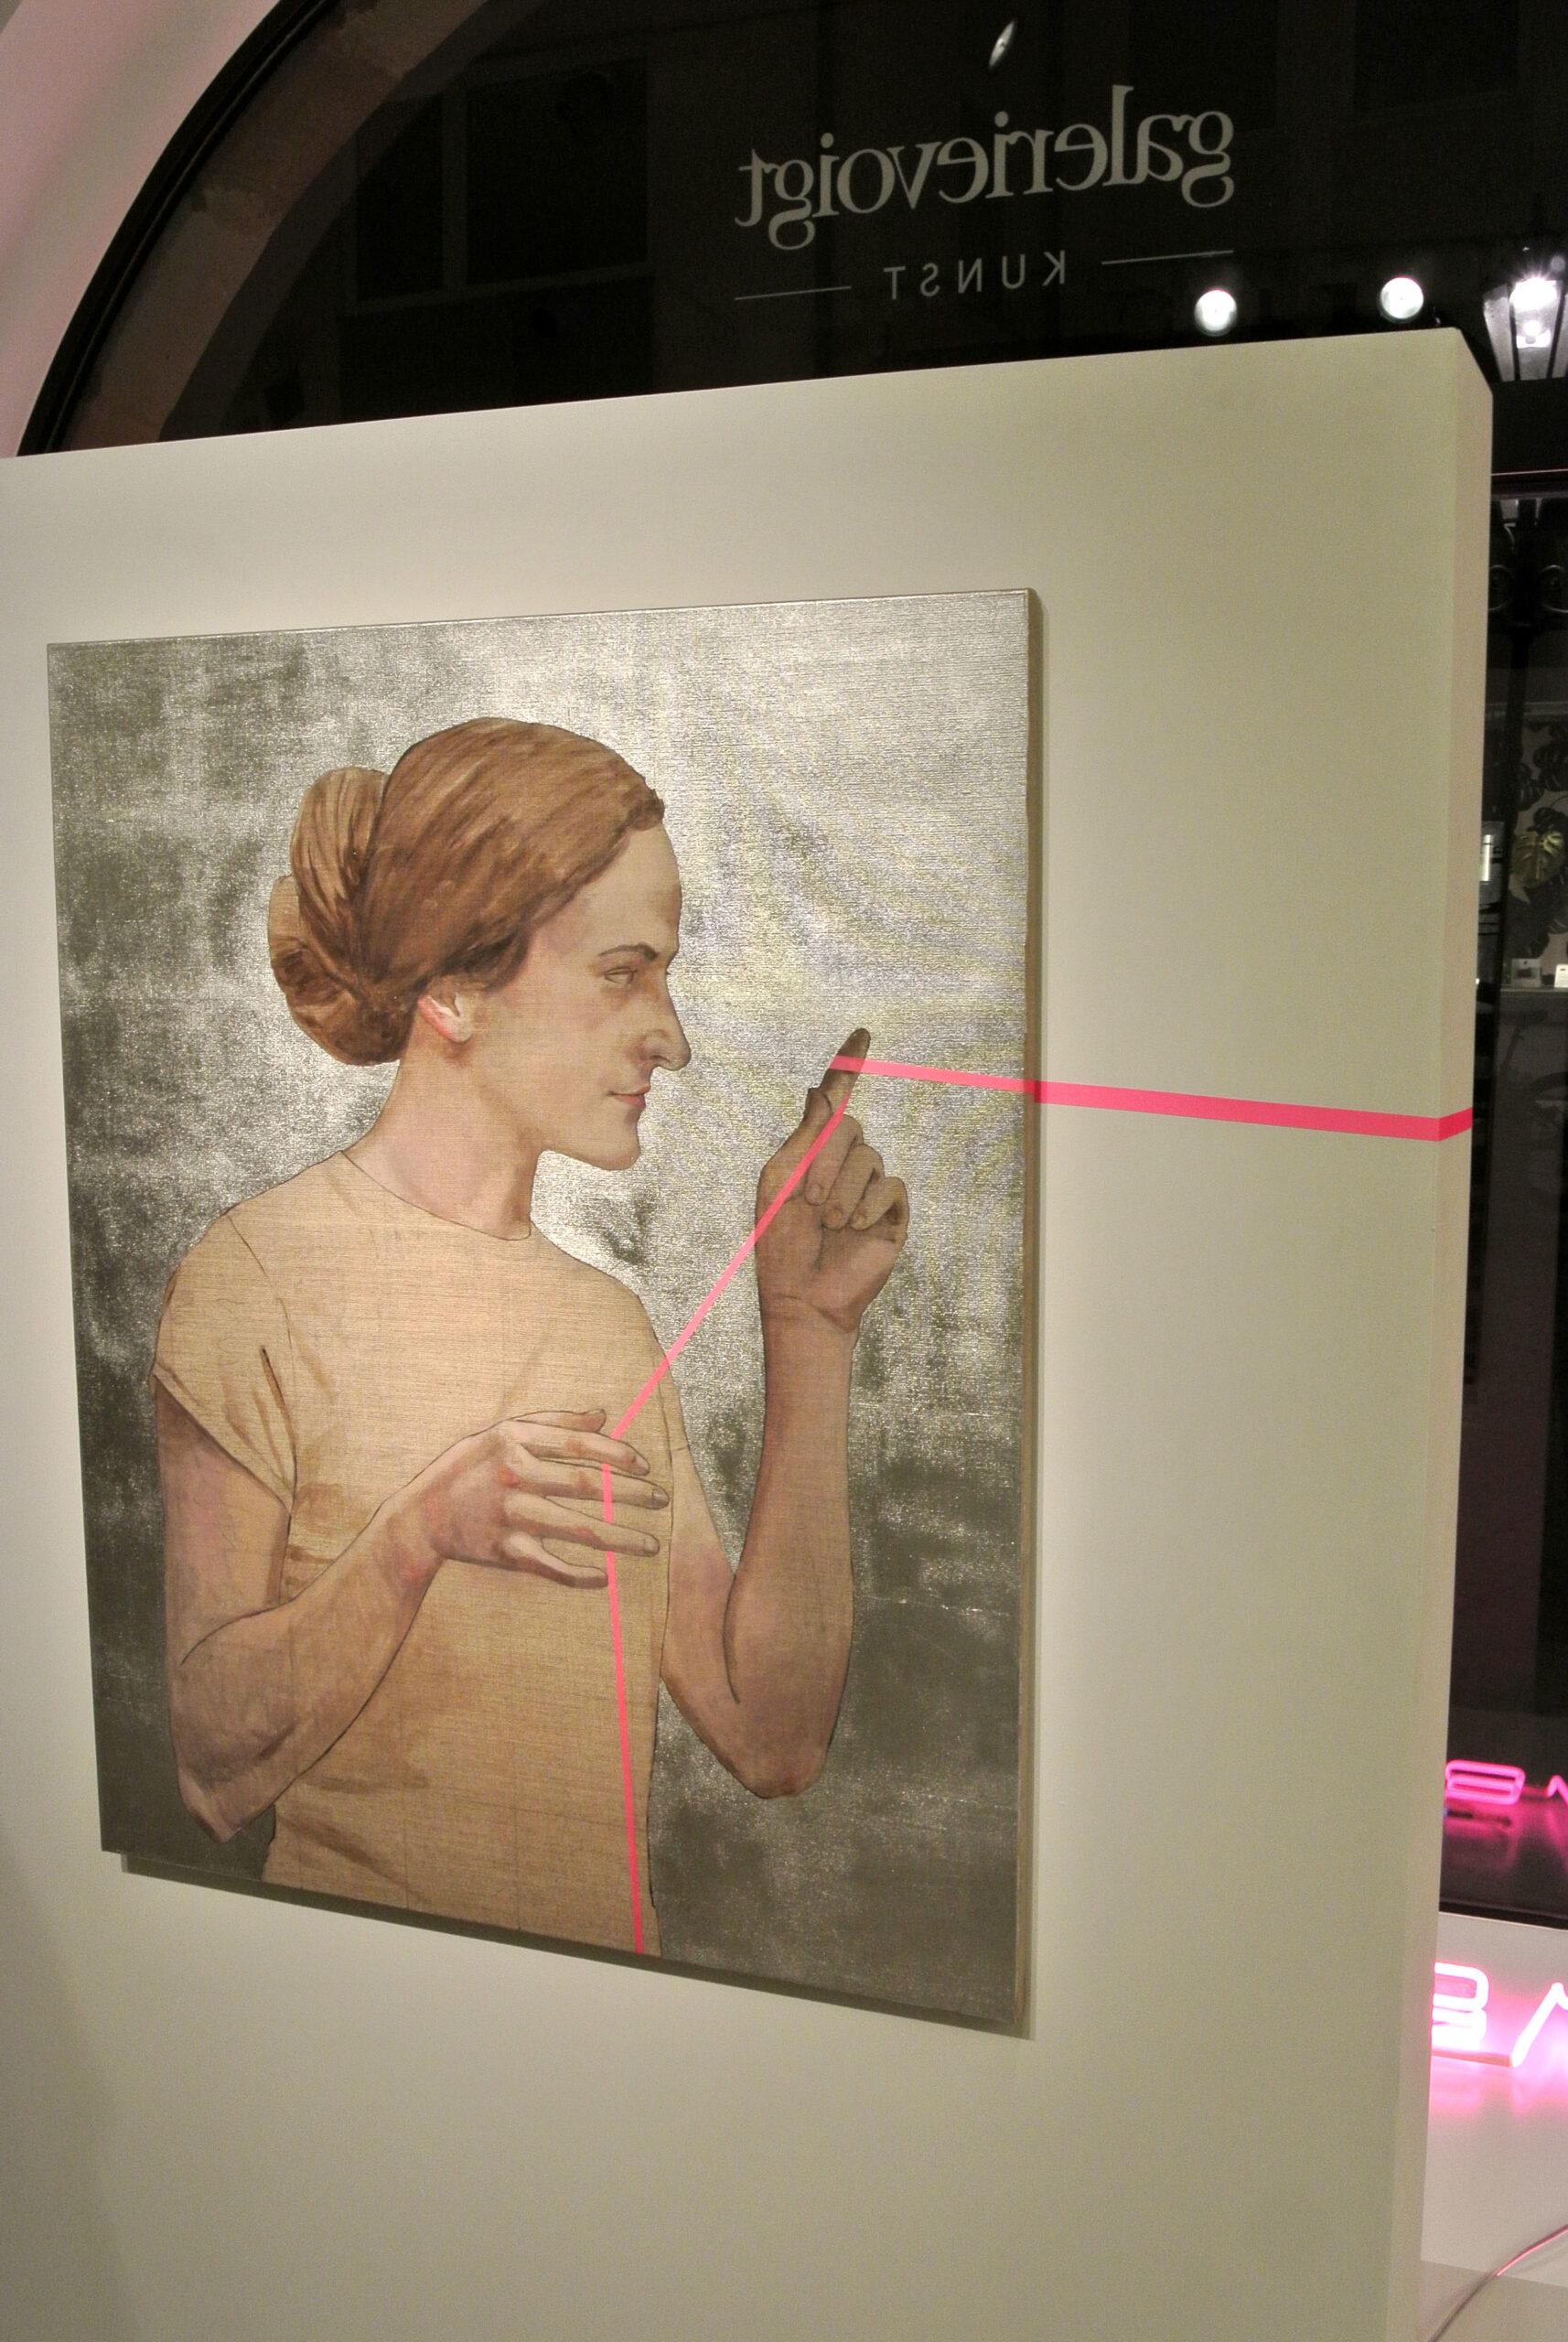 Birgit Nadrau: Unikat, Öl, Blattaluminium und Washiband auf Leinwand, 80 x 100 cm, 3.600 eur.